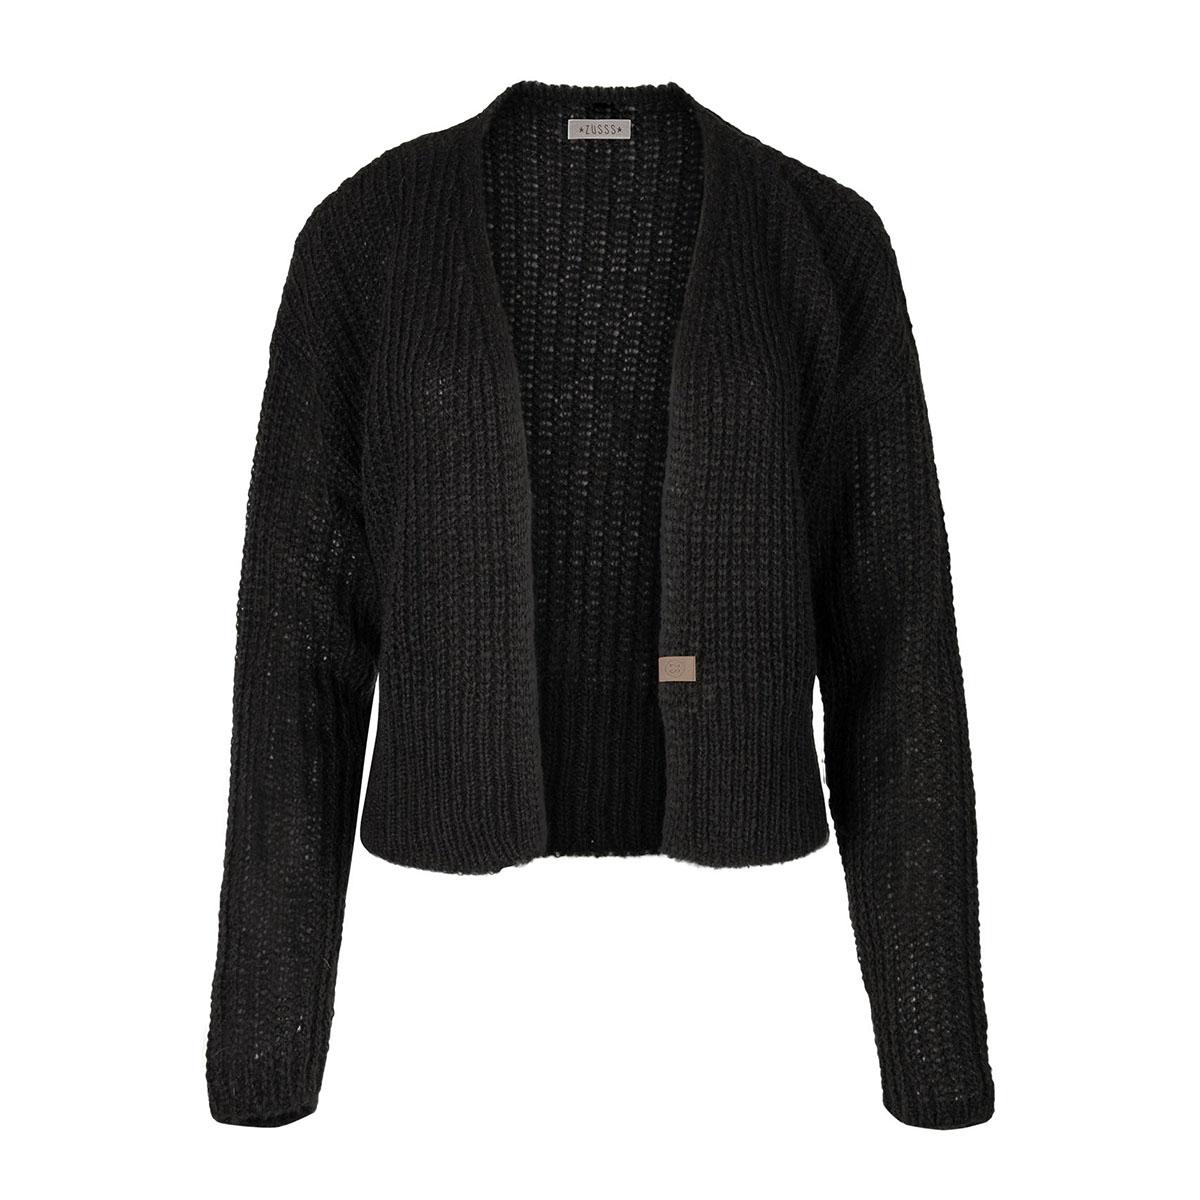 03kv19v zusss vest cob black